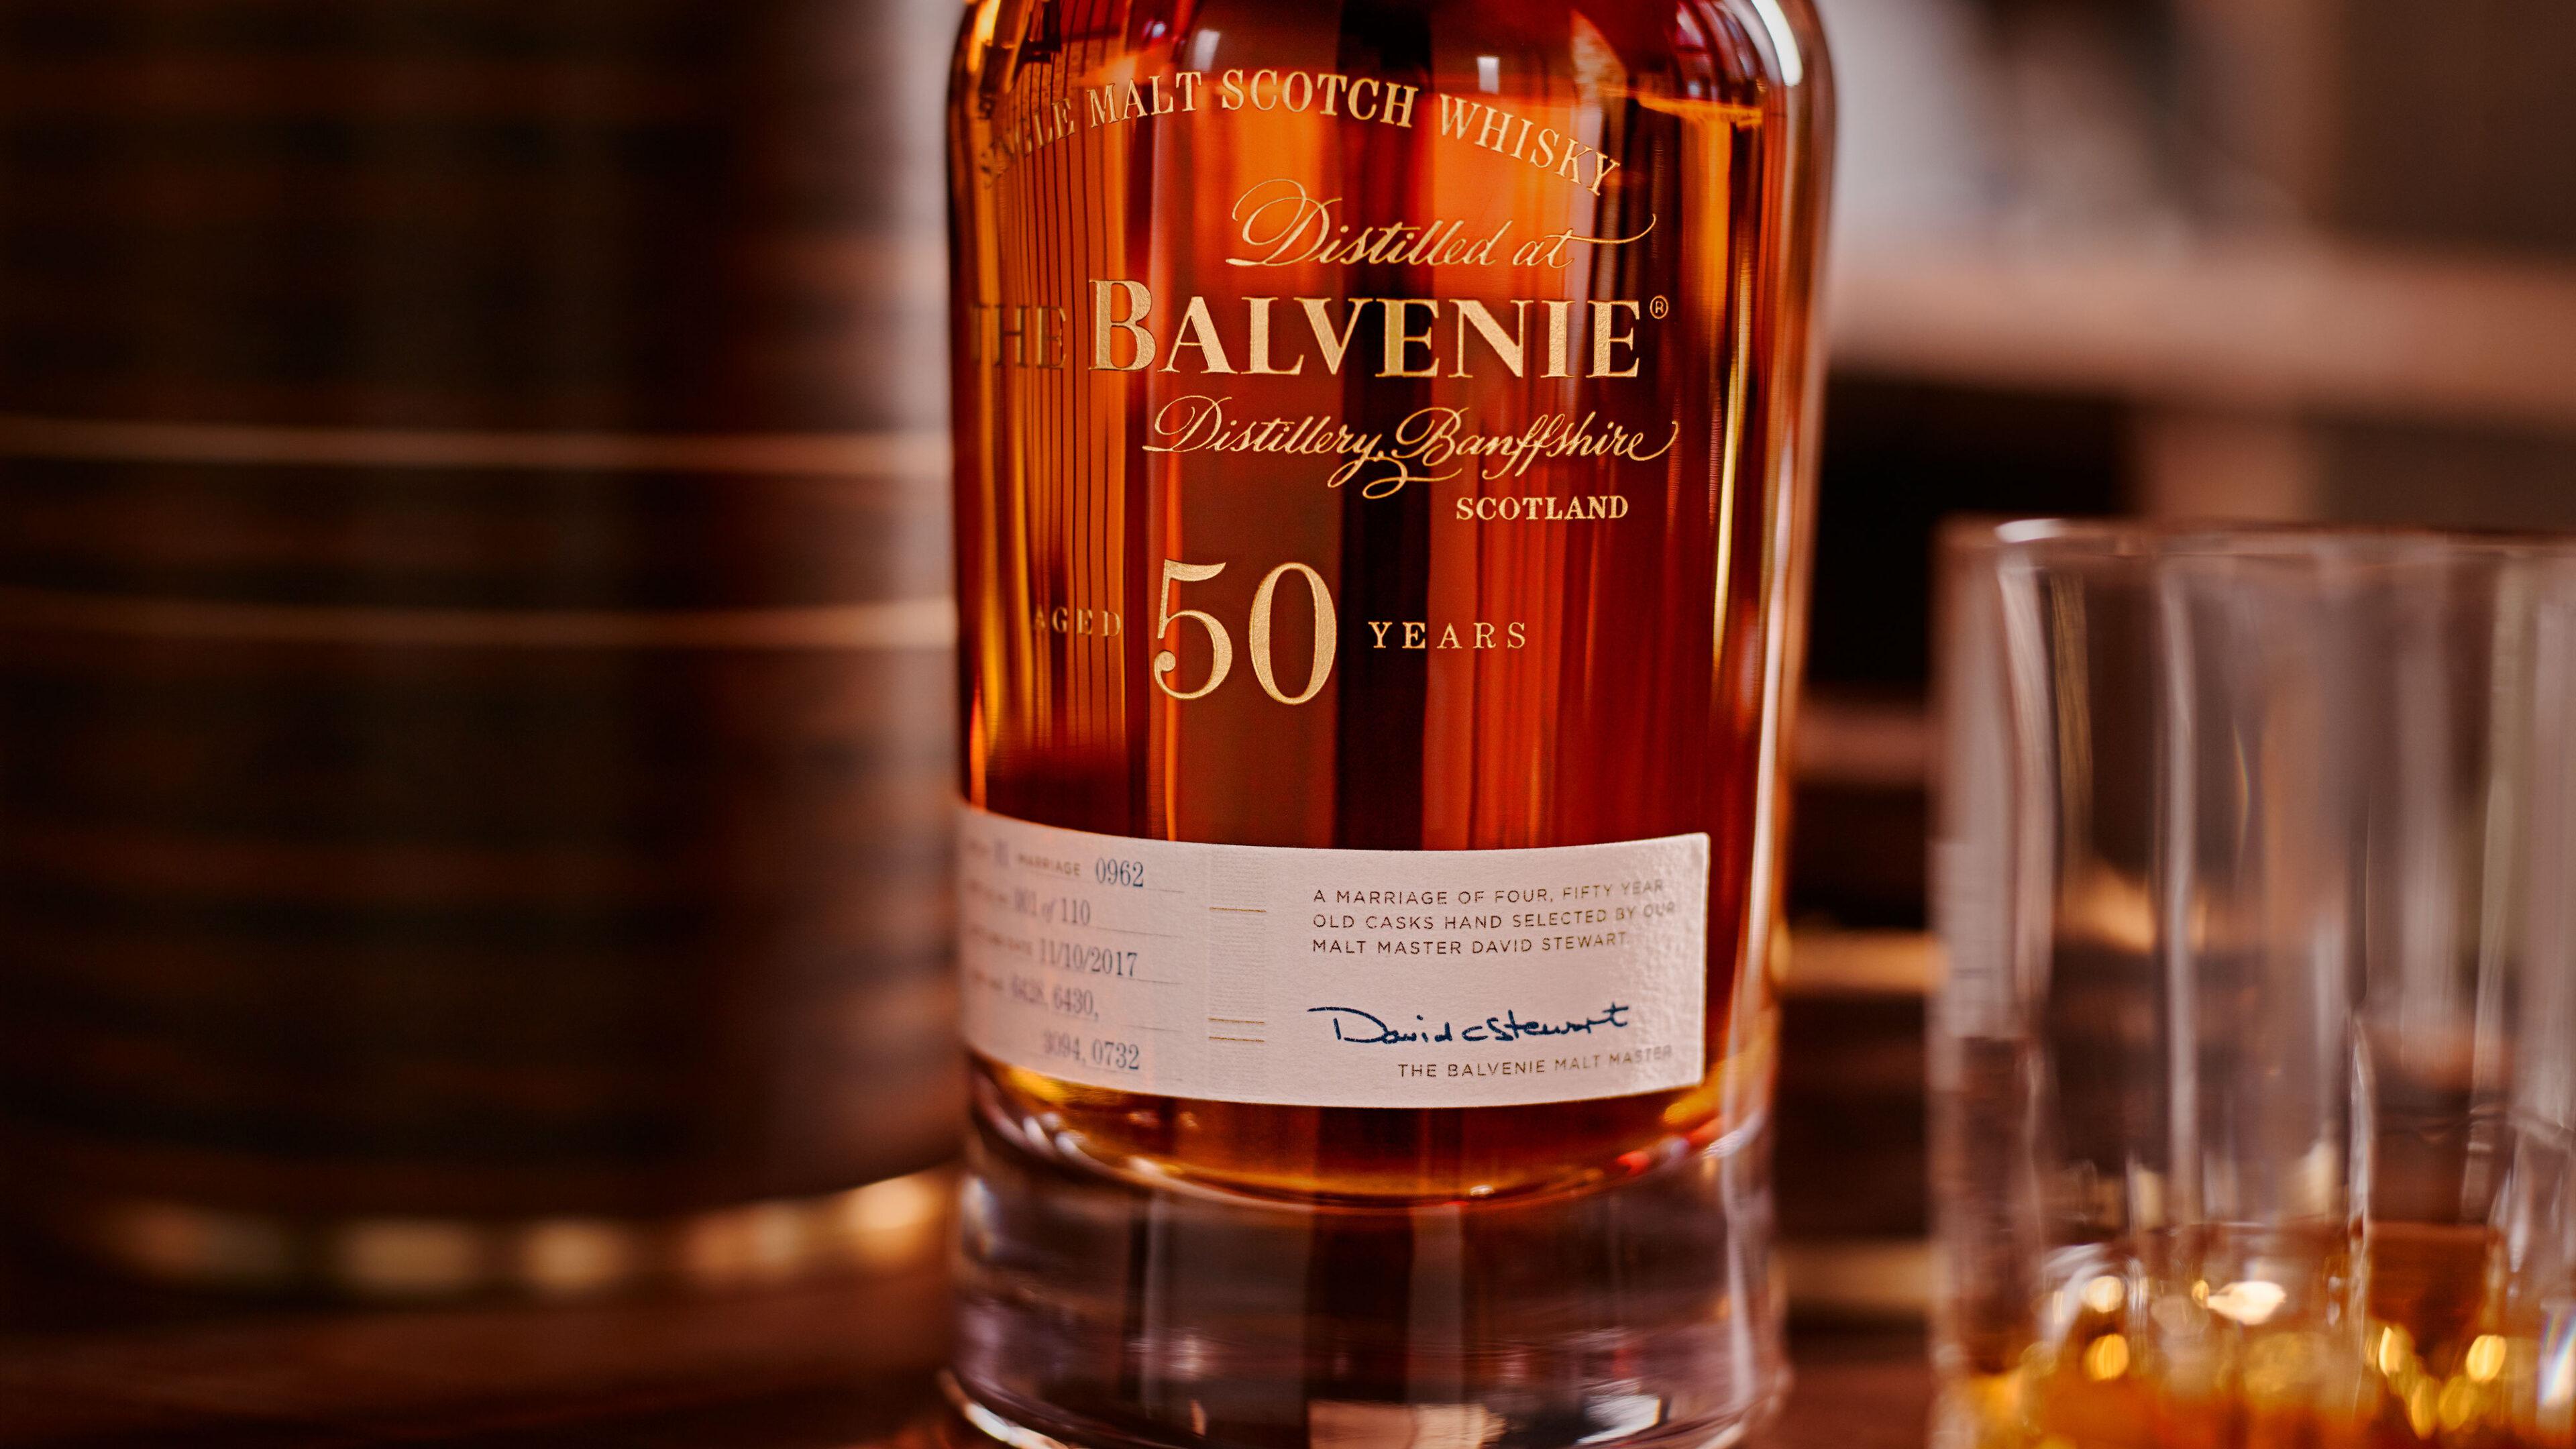 Balvenie 50 YR INCIDENTALS 0380 W1